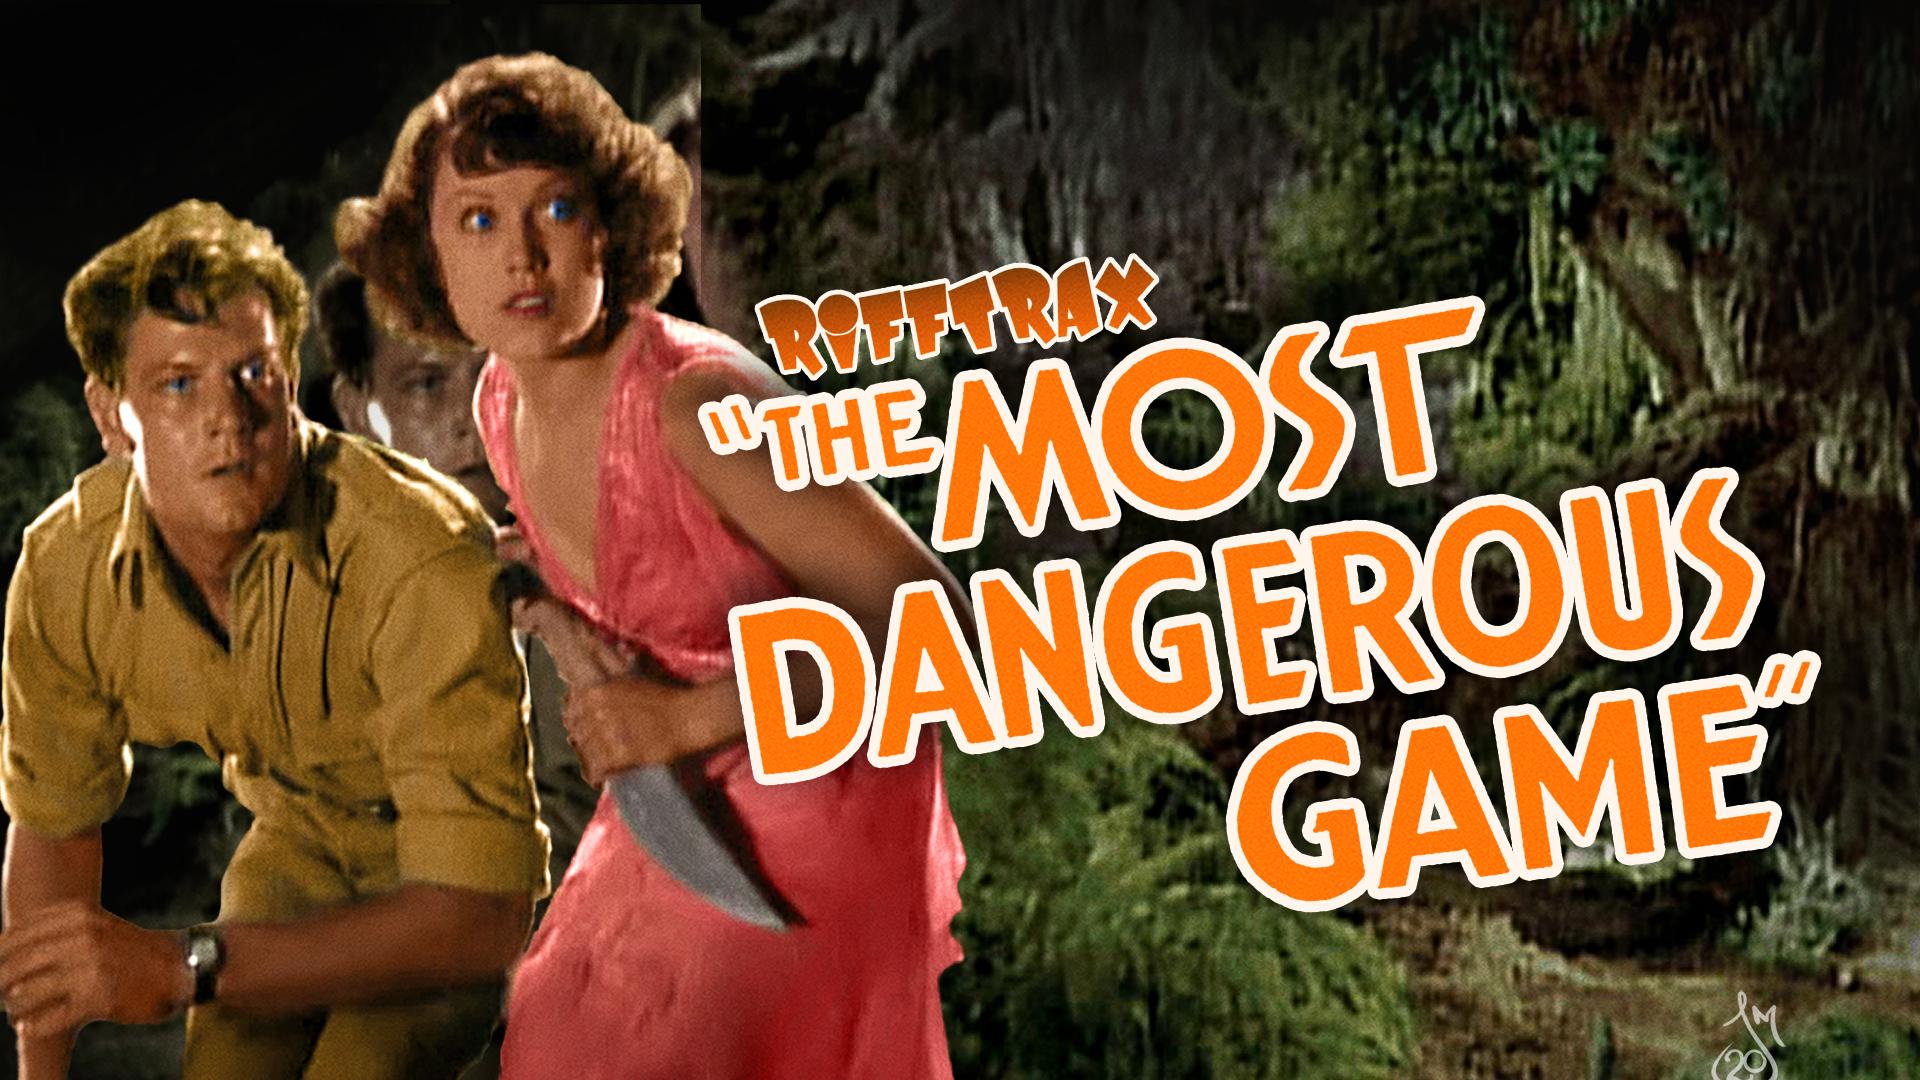 RiffTrax: Most Dangerous Game